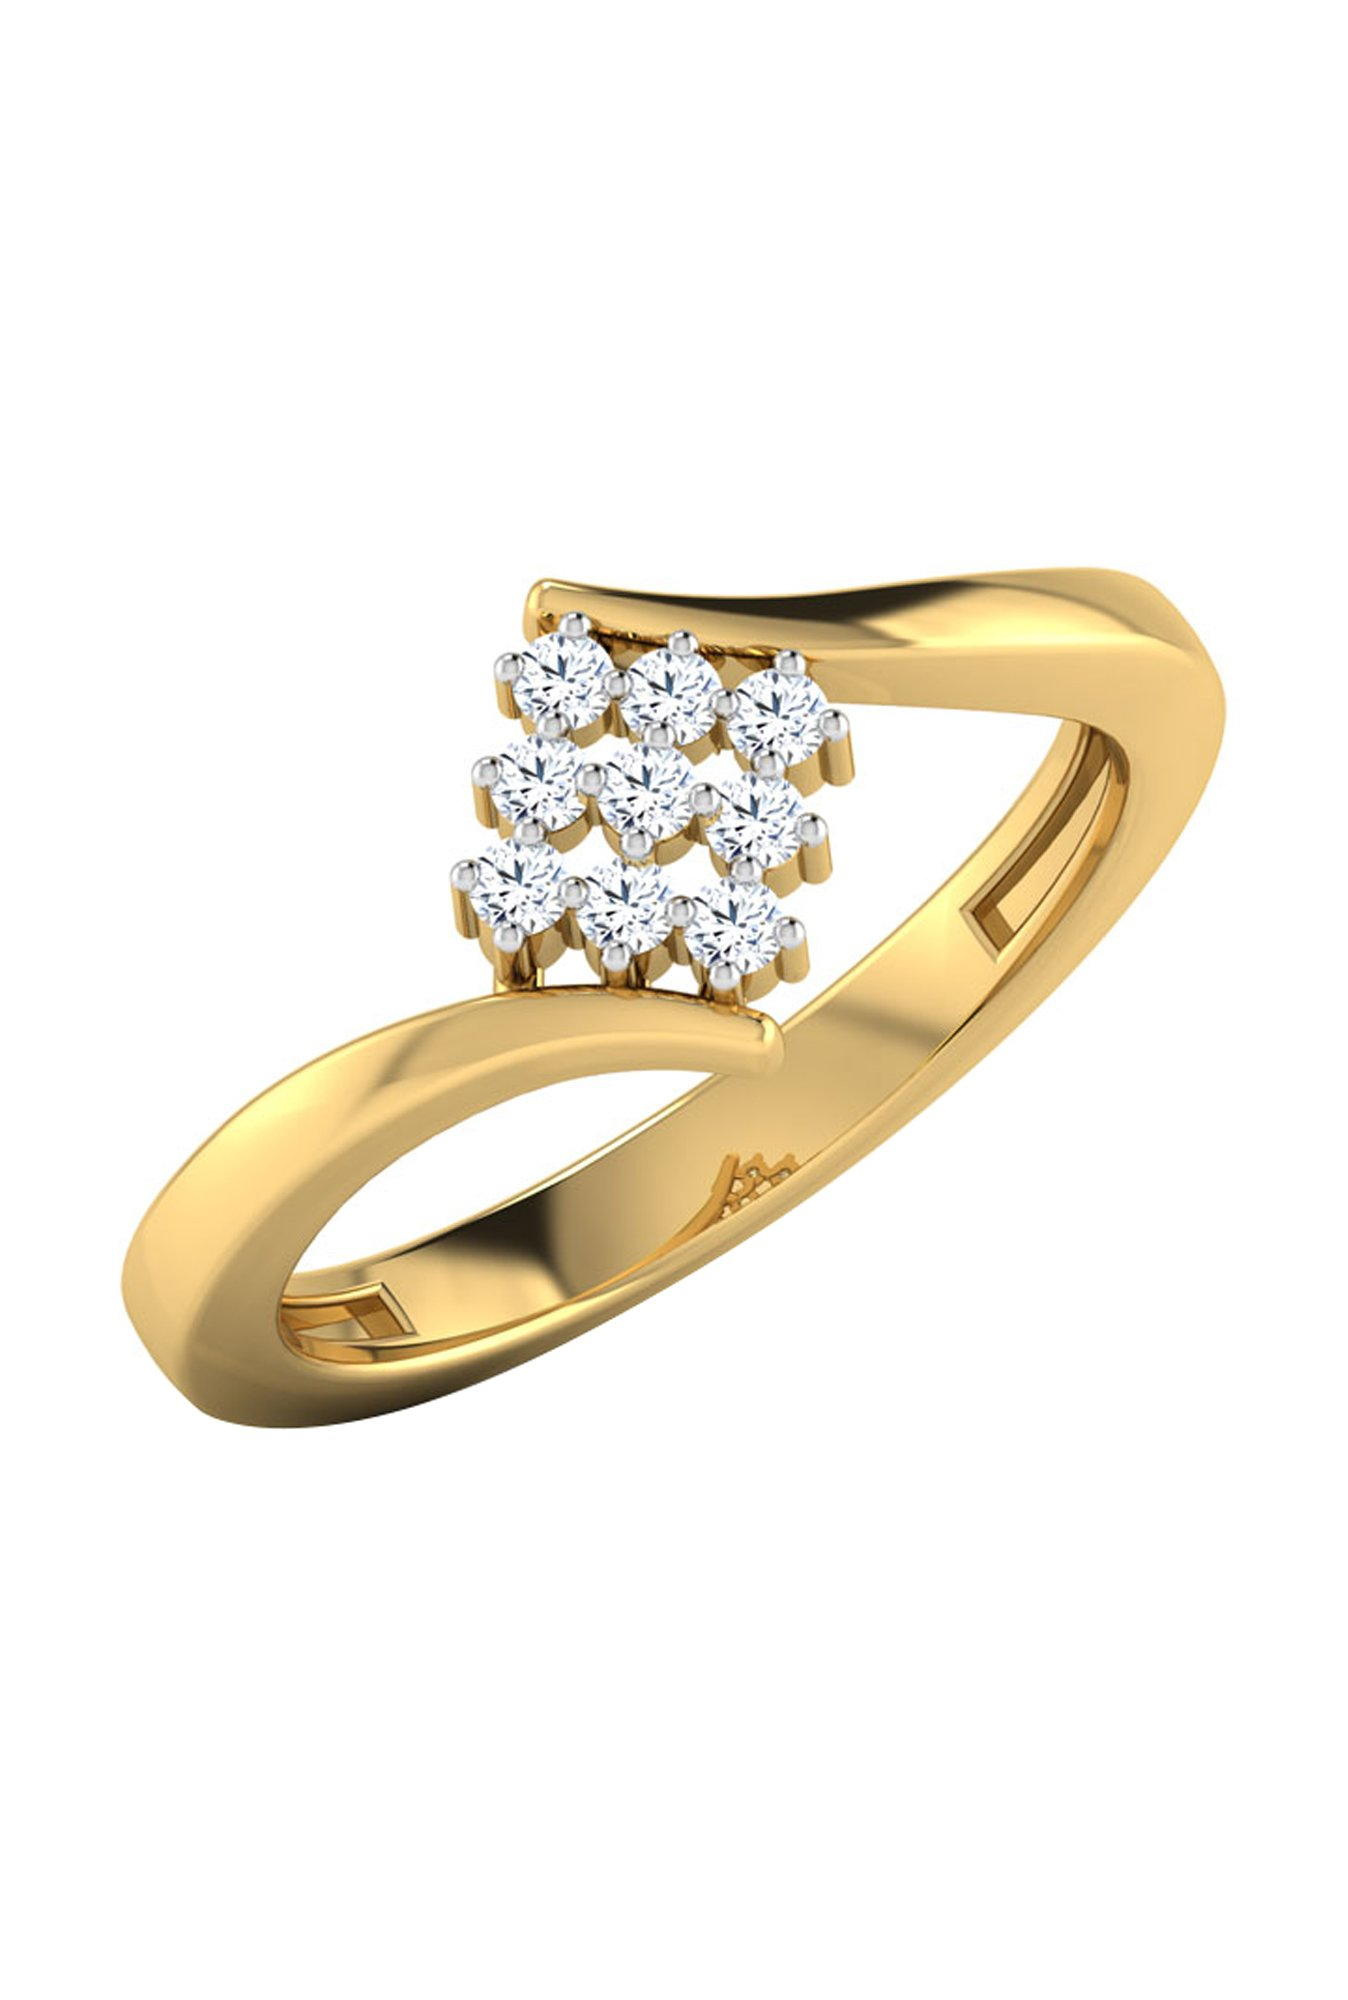 c673def51d053 Buy CaratLane Evelyn 18k Gold & 0.098 ct Diamond Ring Online At Best ...